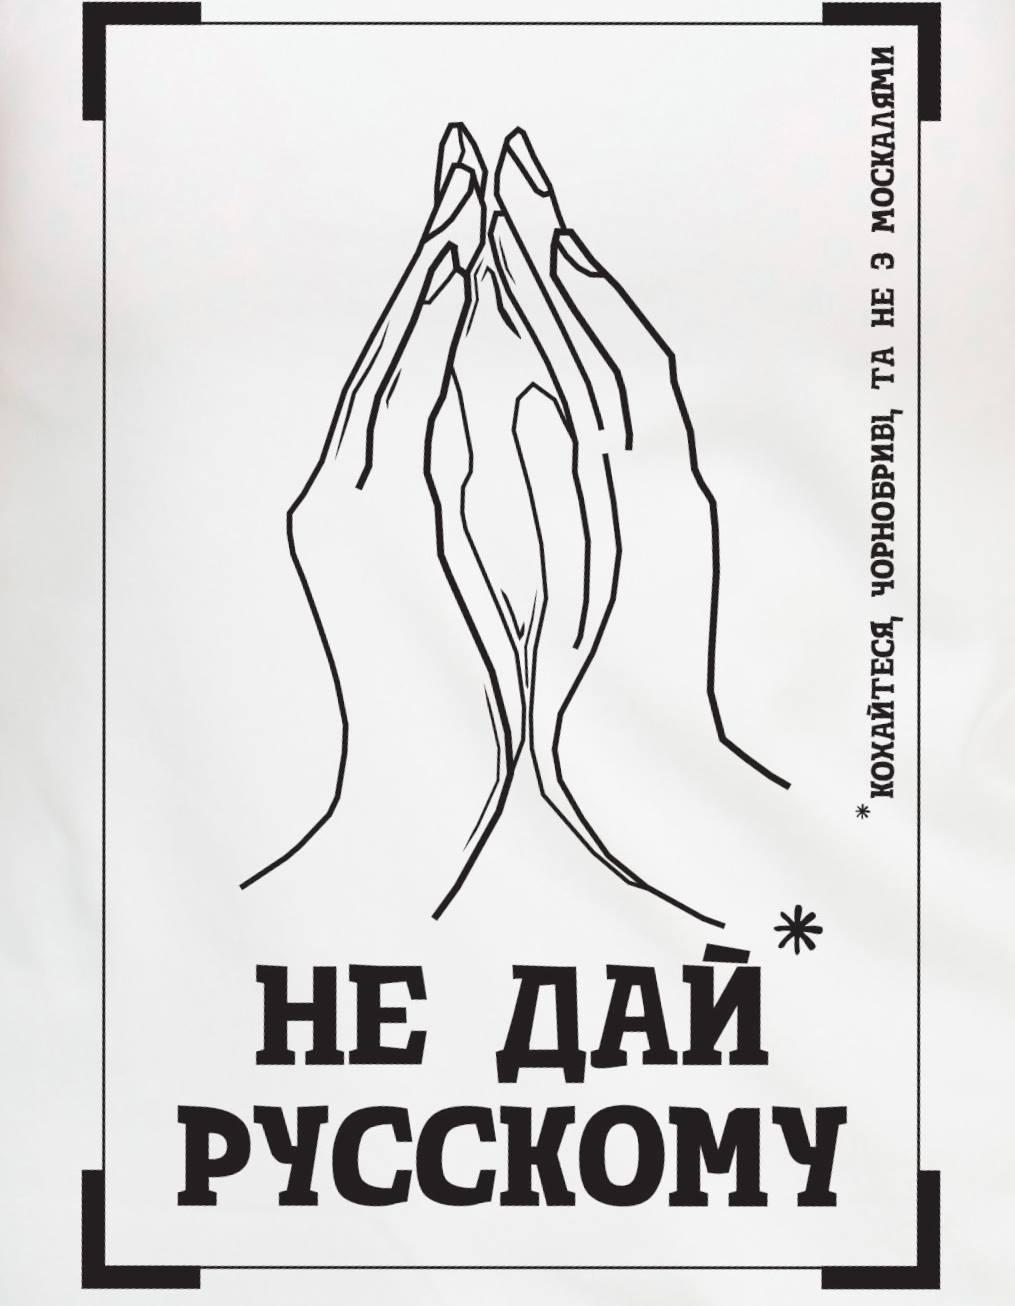 ukrainesexstrike4